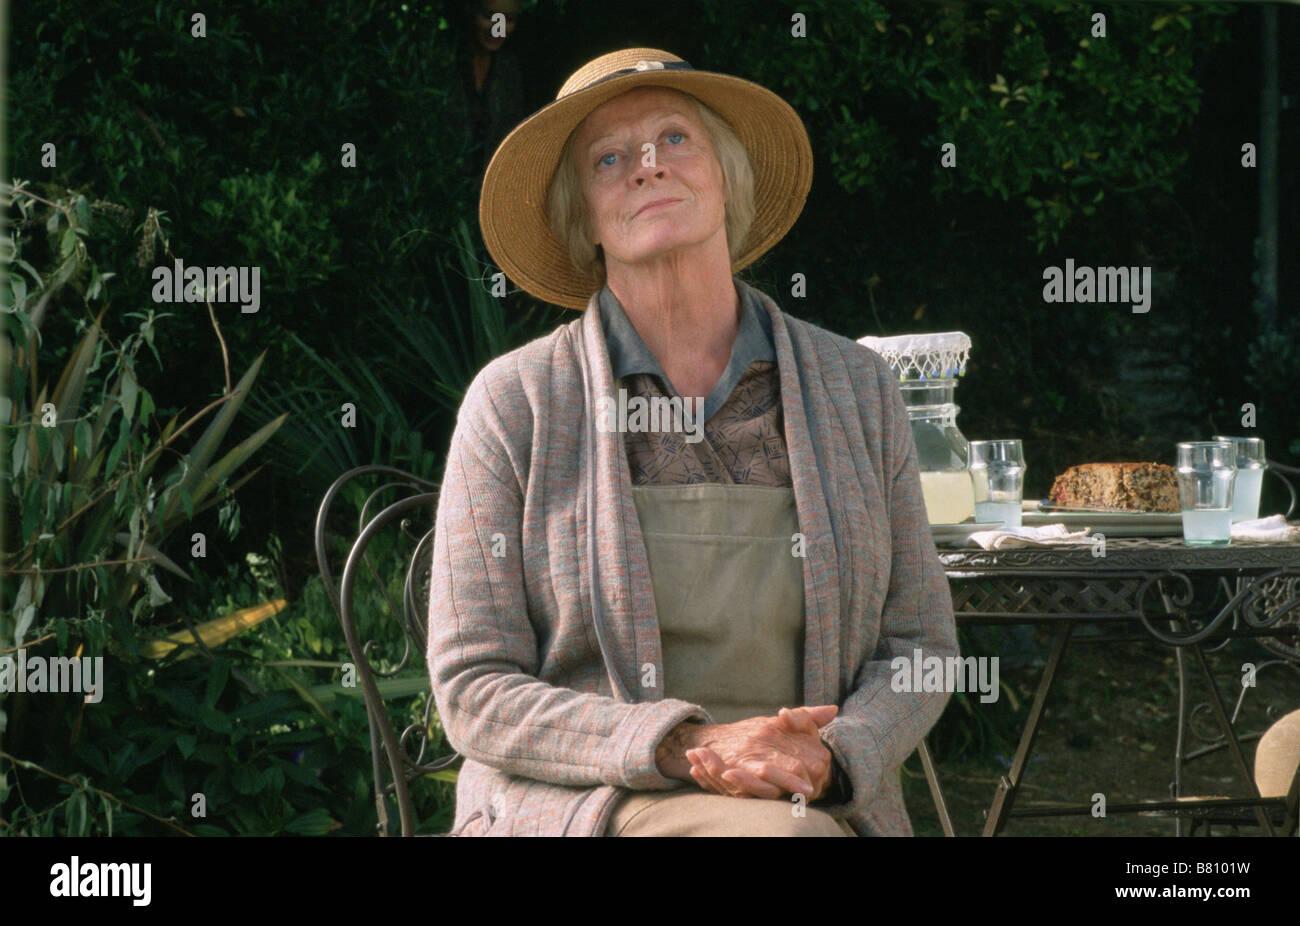 Les dames de Cornouailles Ladies in lavender  Year: 2005 - UK Maggie Smith  Director: Charles Dance Stock Photo